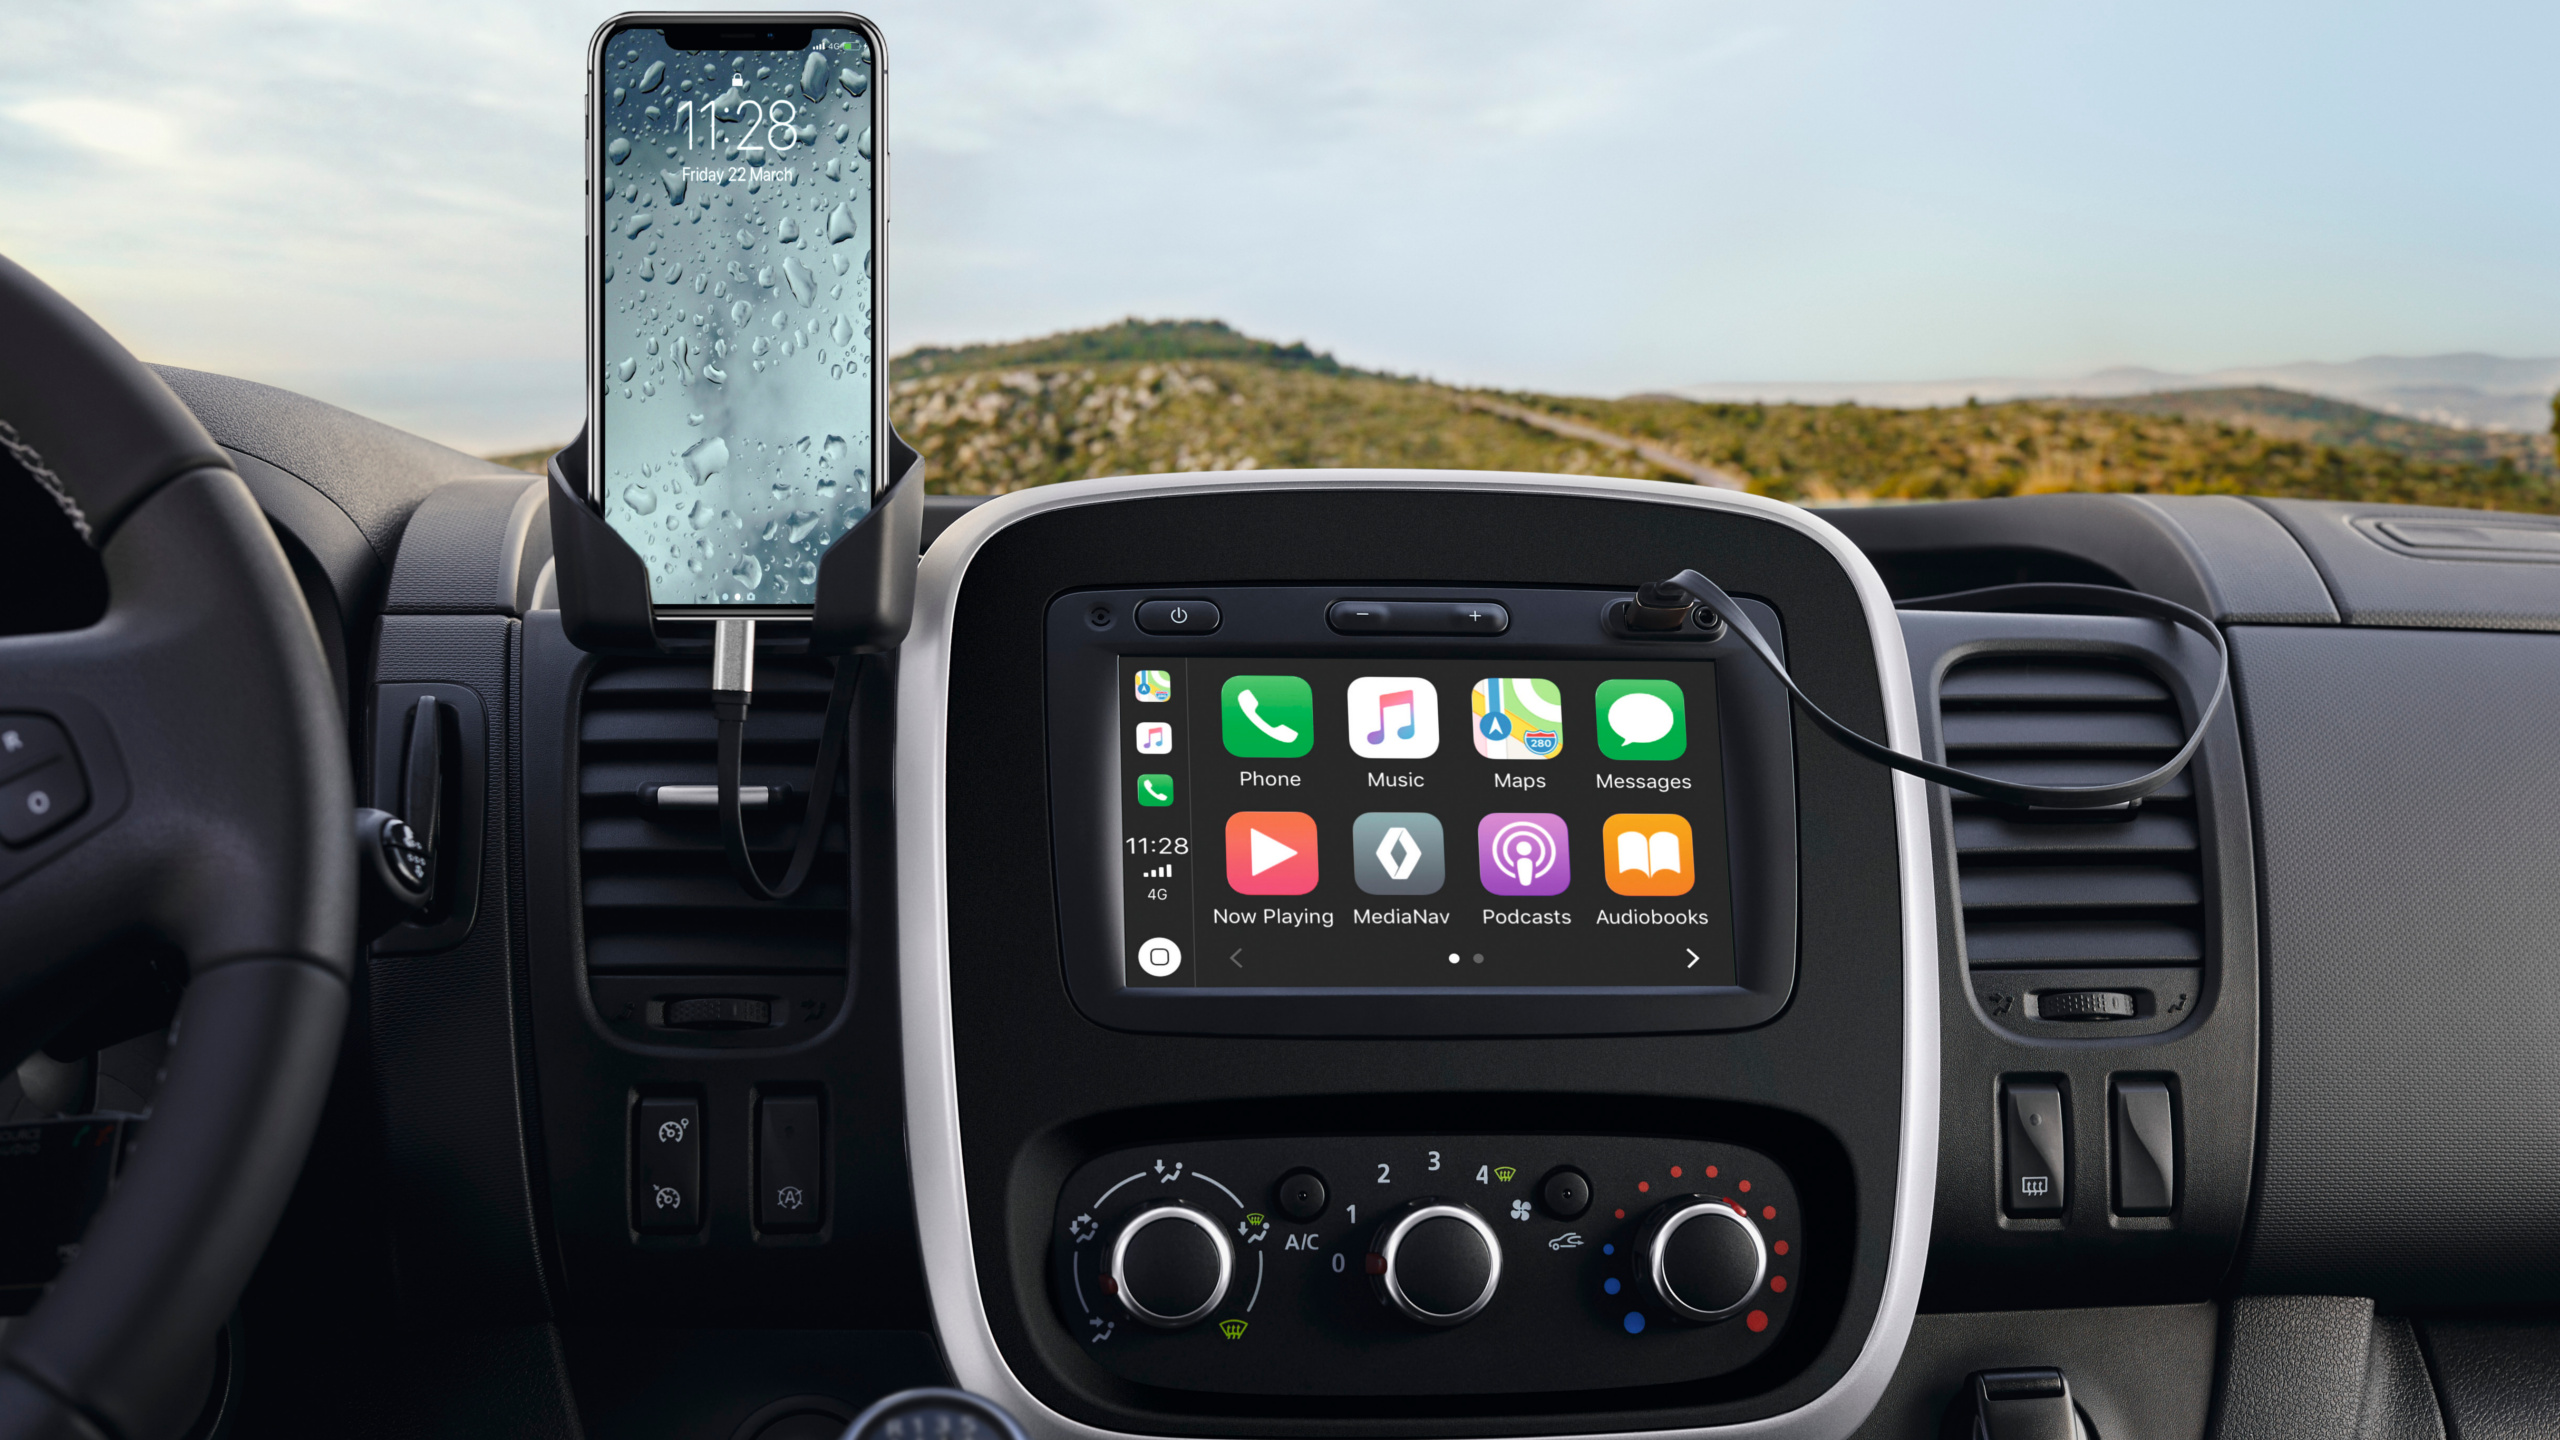 Renault Trafic Smart interface